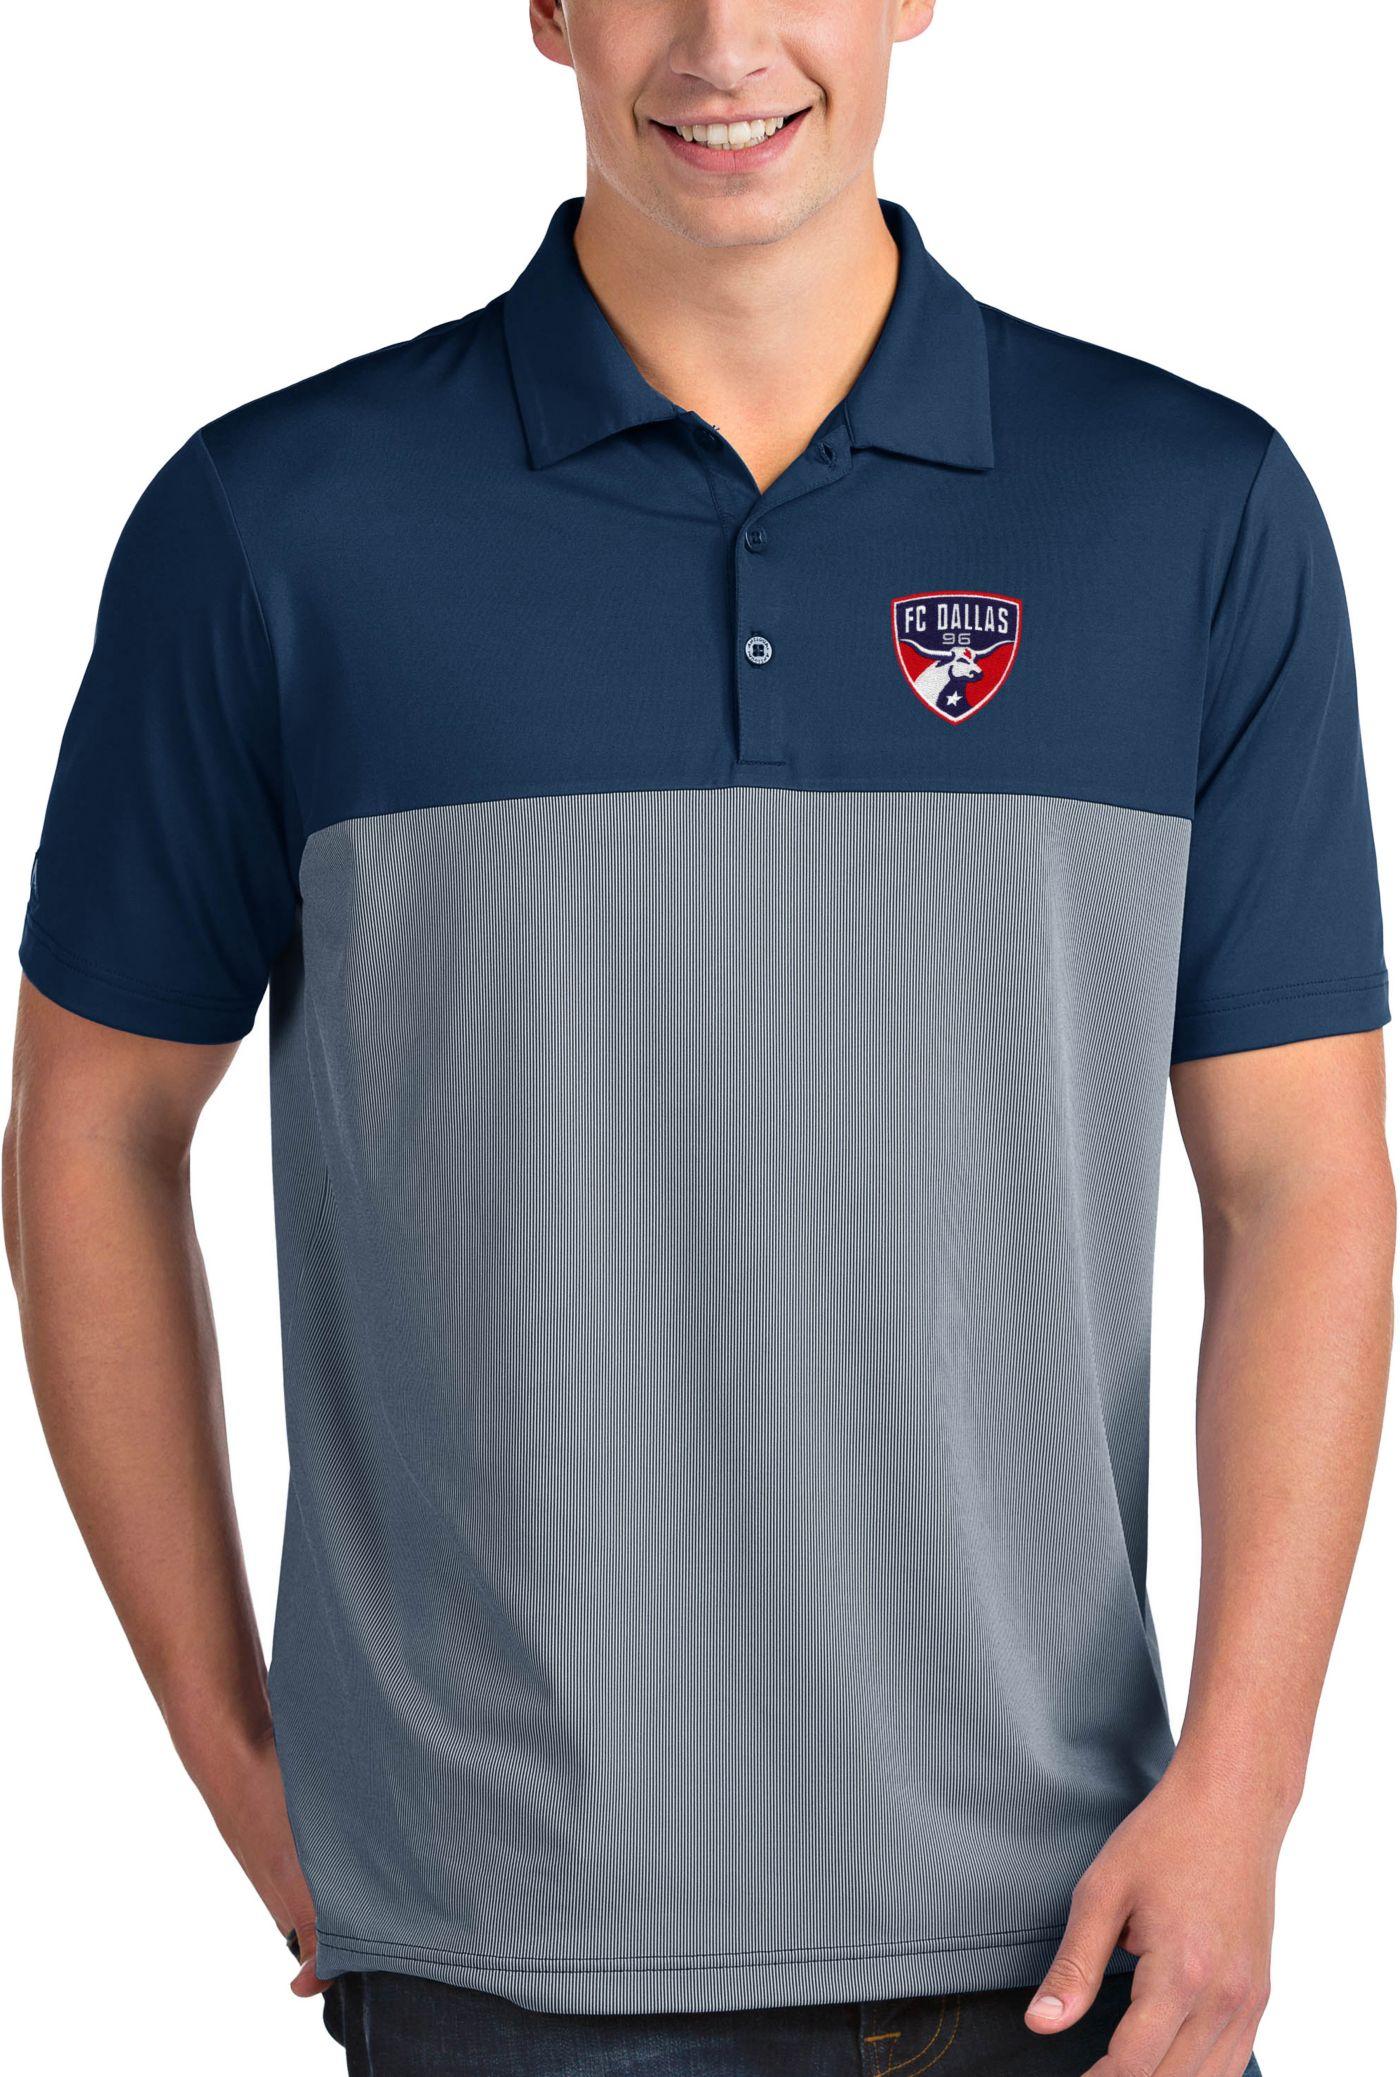 Antigua Men's FC Dallas Venture Navy Polo